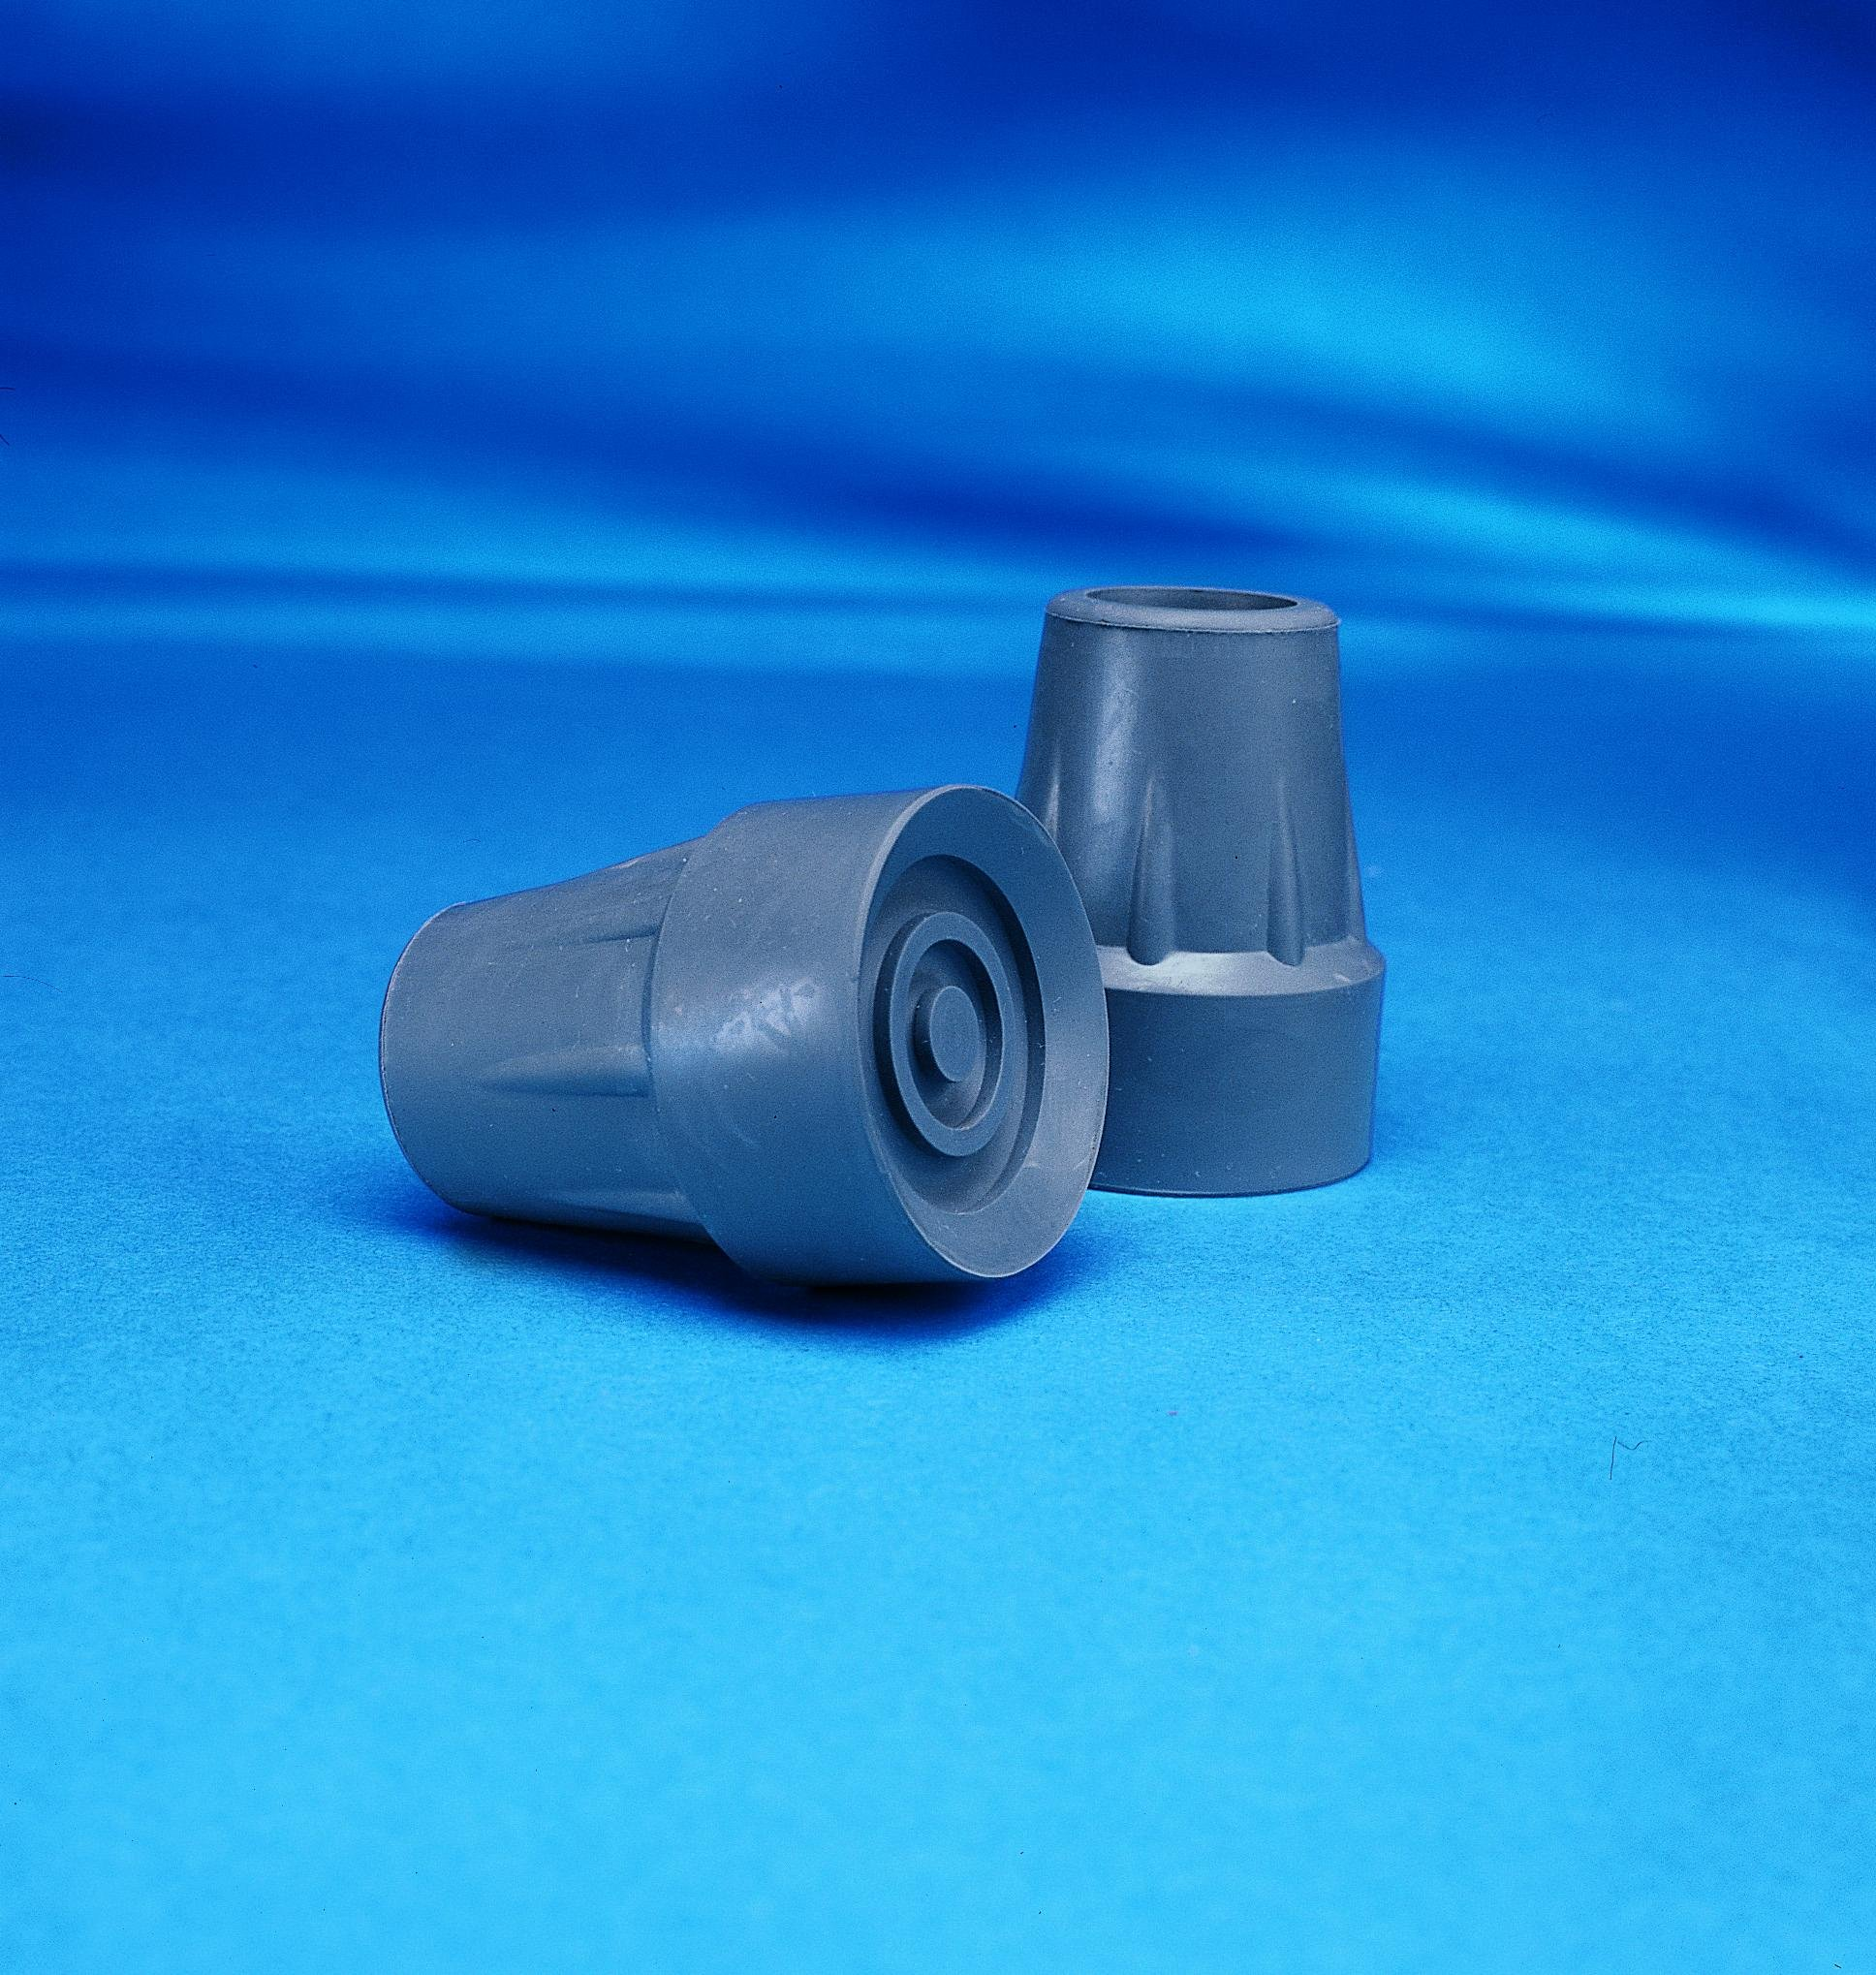 INV6134 - Rubber Crutch Tip, Large 1-3/4, Gray